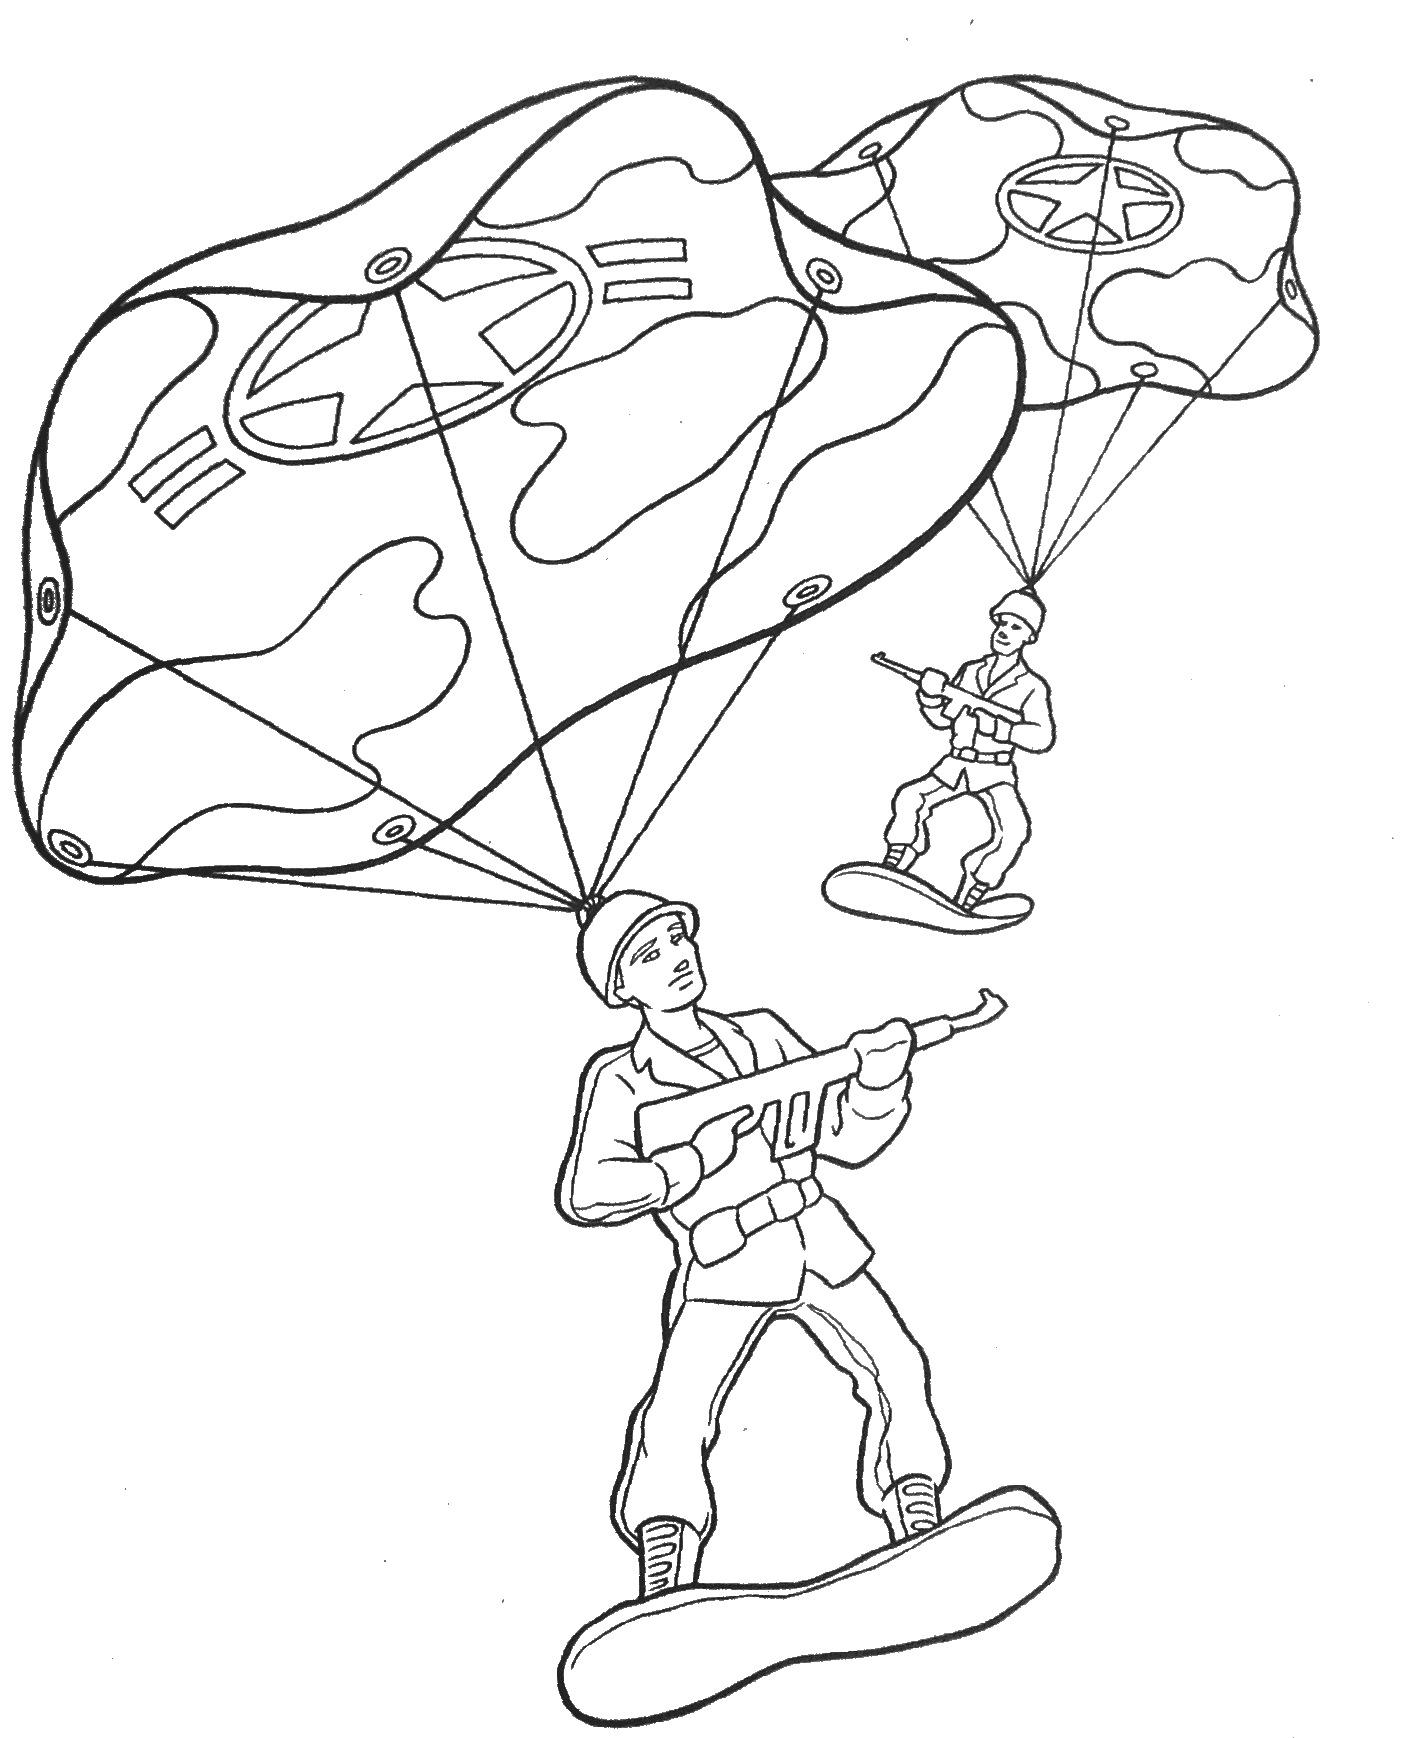 Army Guy Drawing At Getdrawings